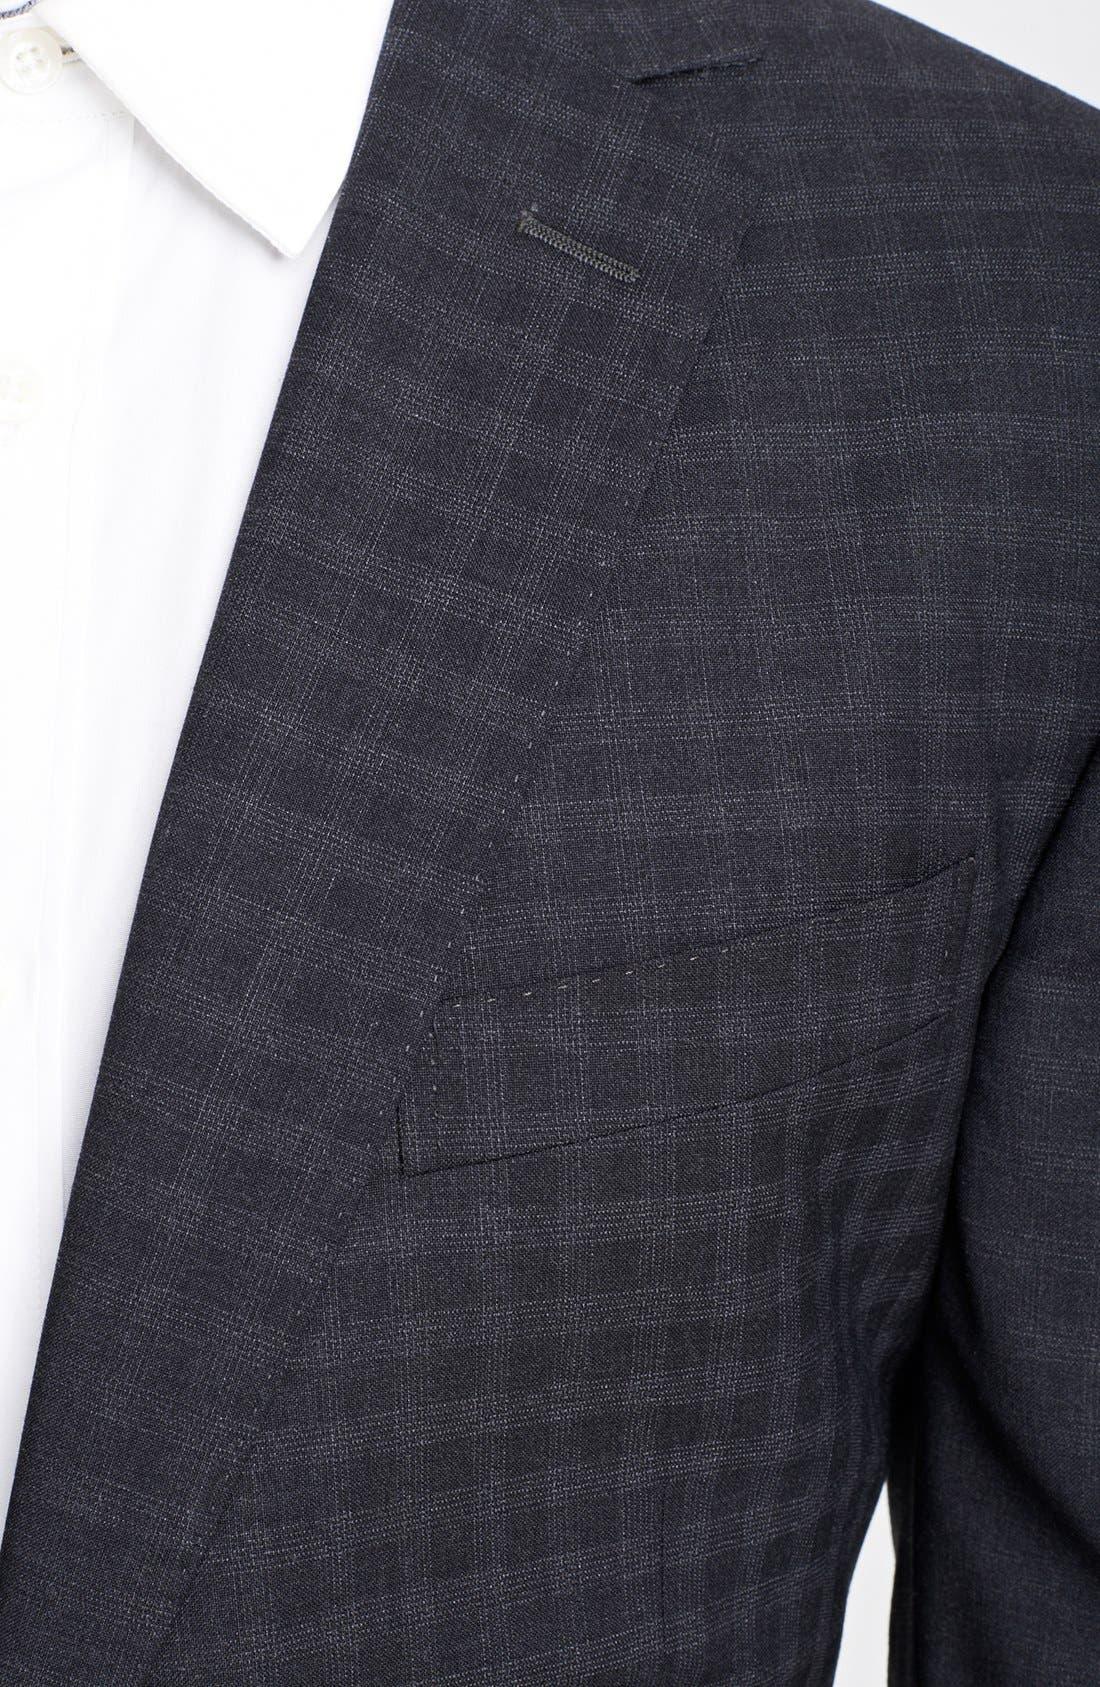 Alternate Image 2  - Z Zegna 'City' Dark Grey Check Wool Suit